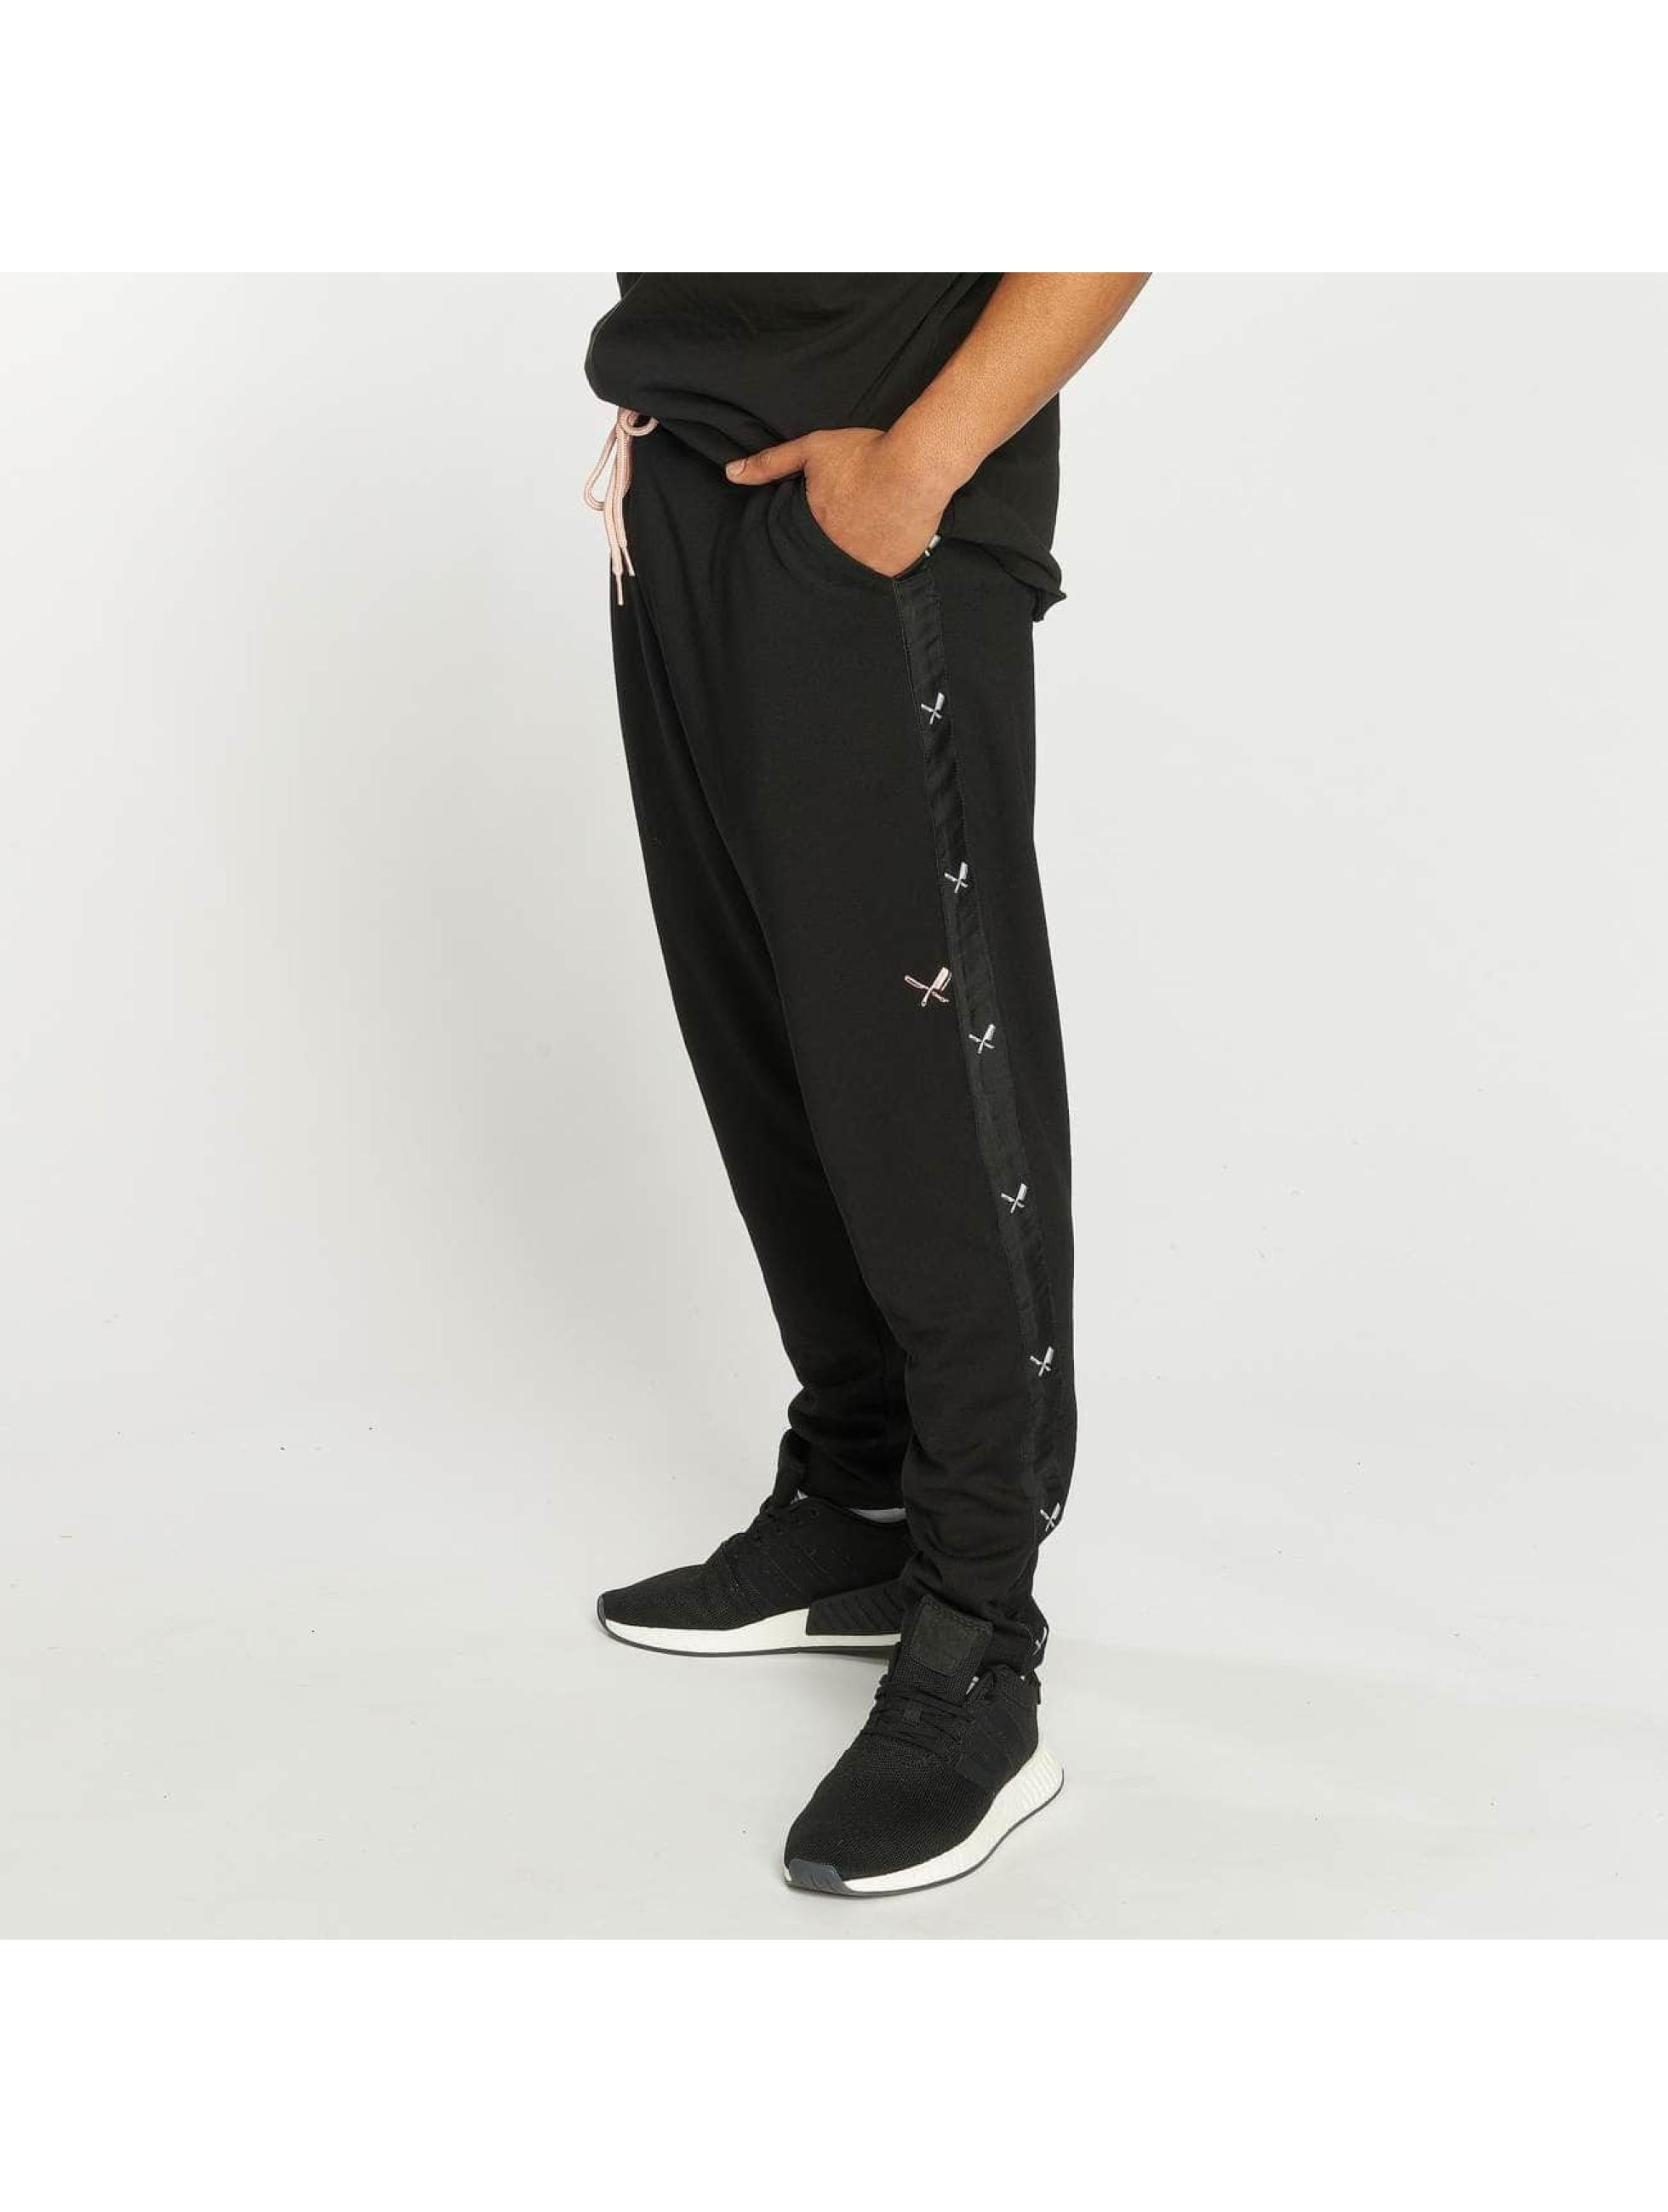 Distorted People Pantalón deportivo Exile negro